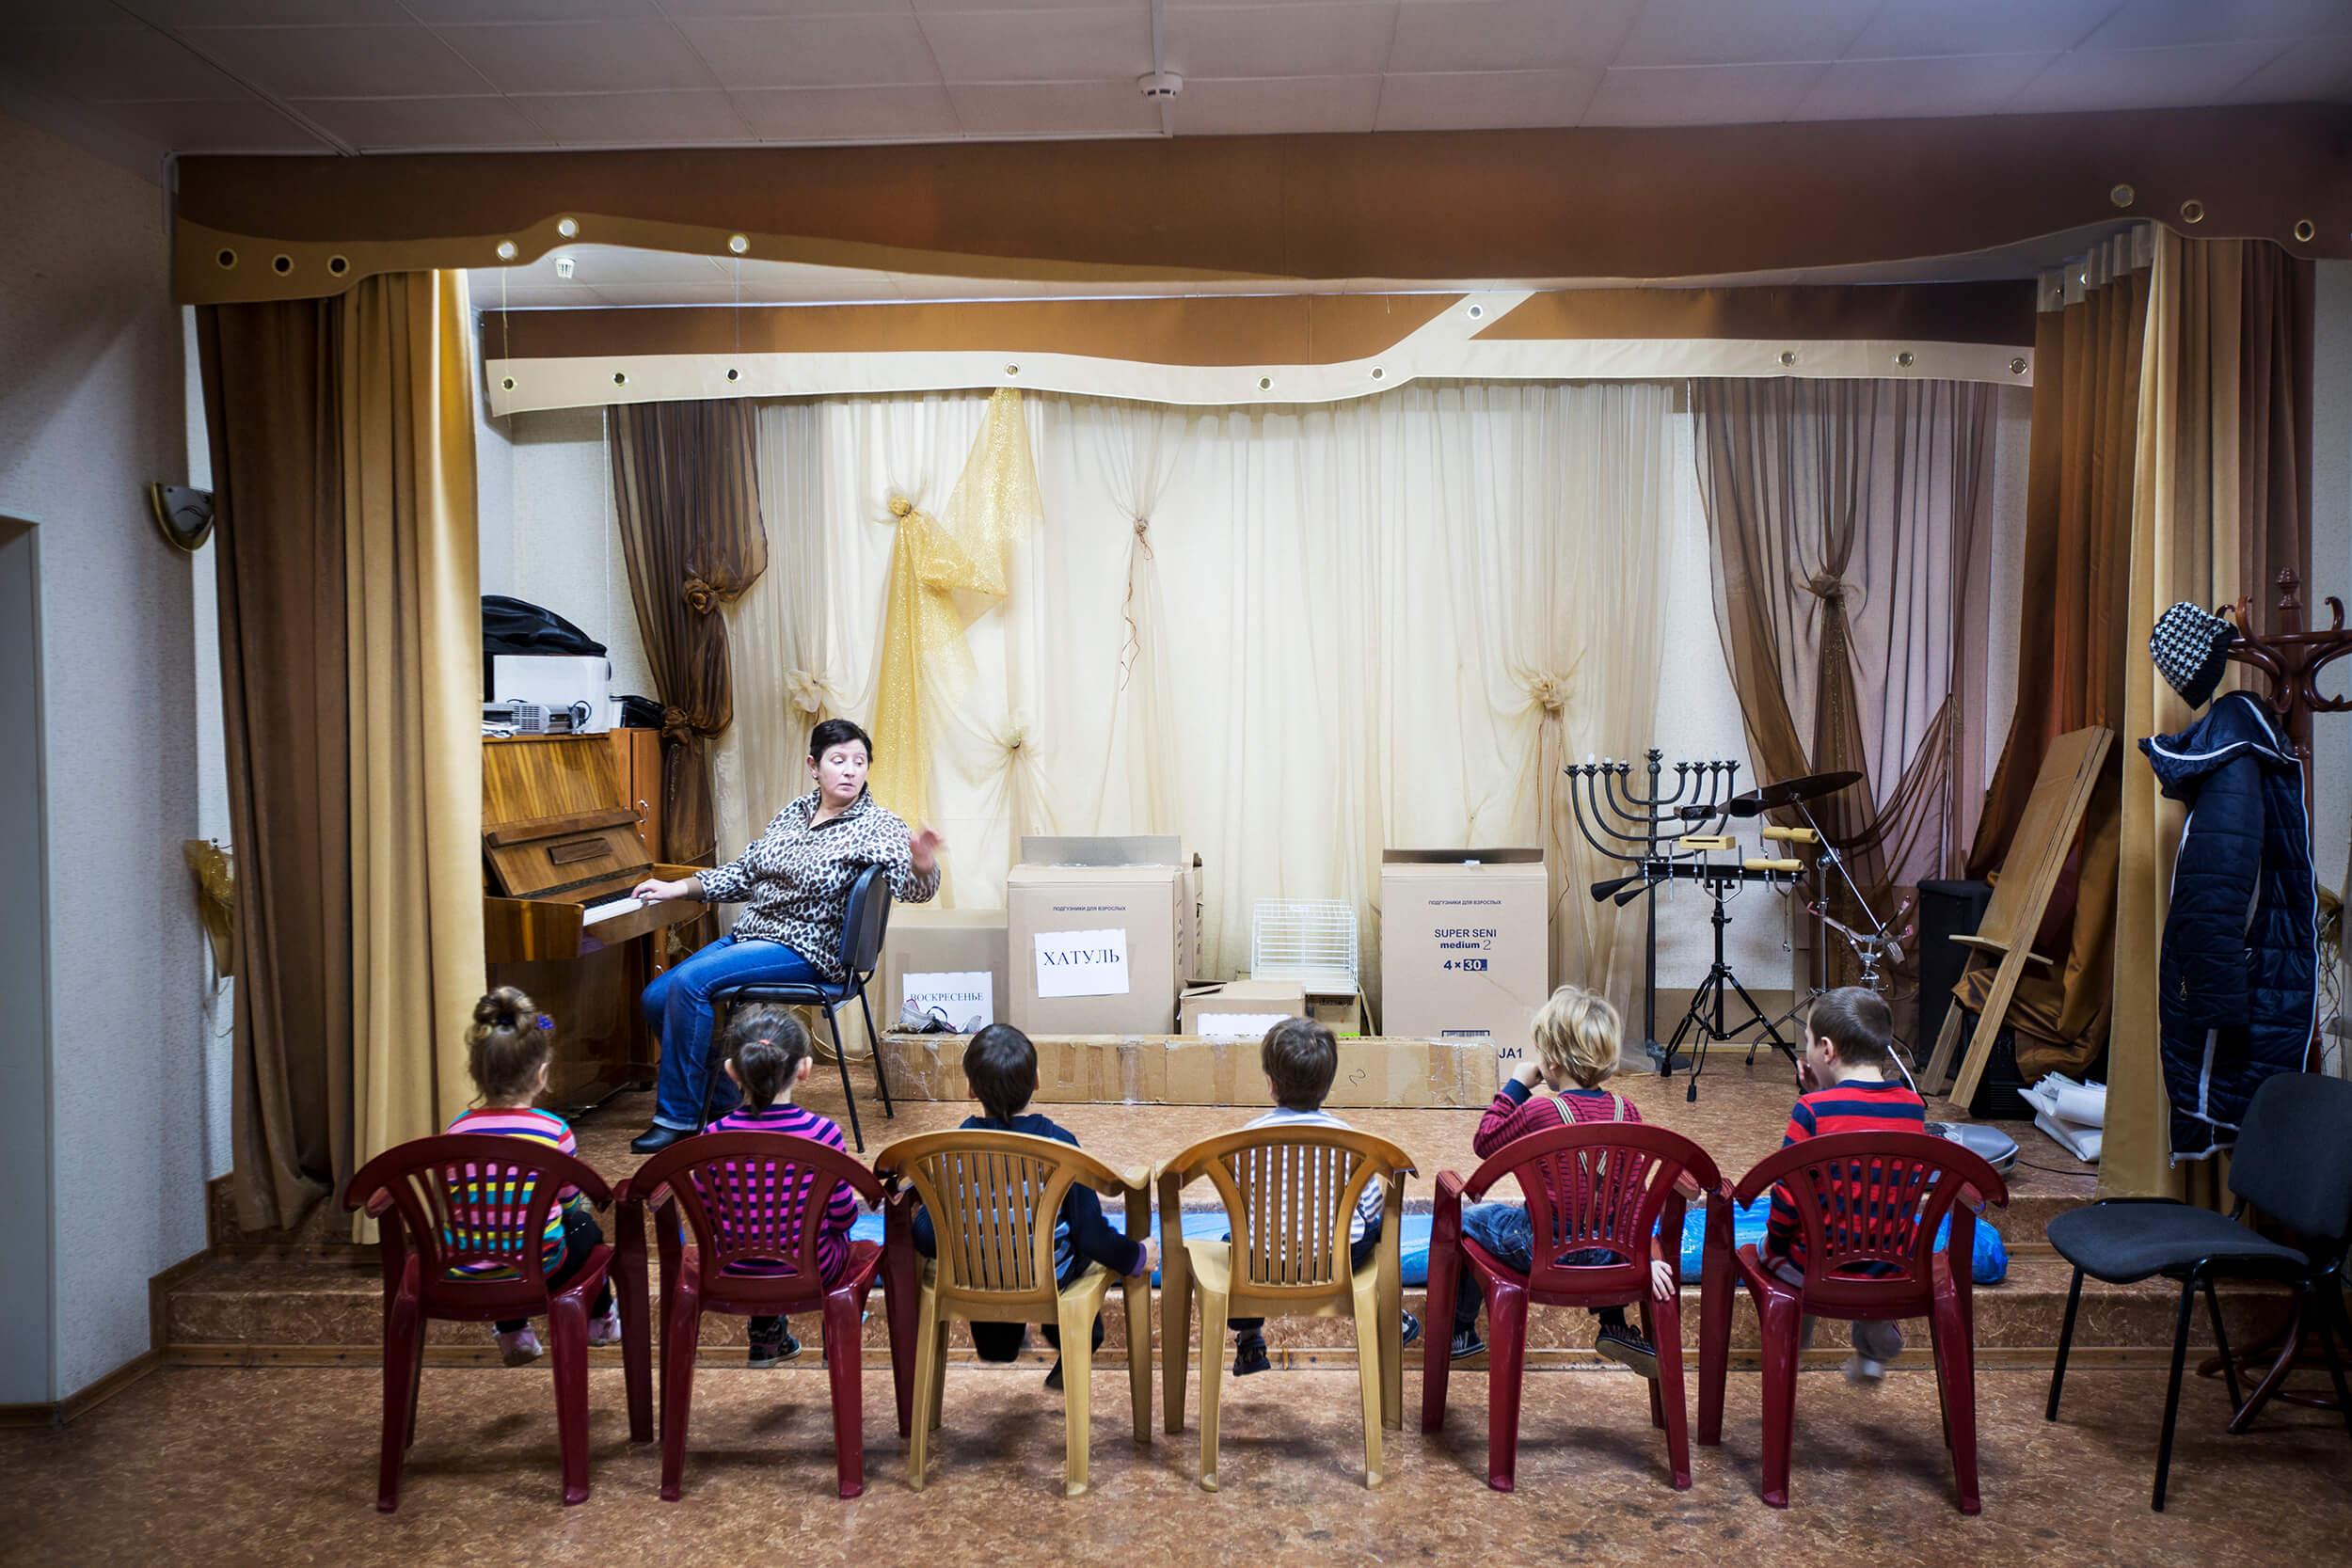 Raisa is a song teacher at the Jewish kindergarten in Simferopol.